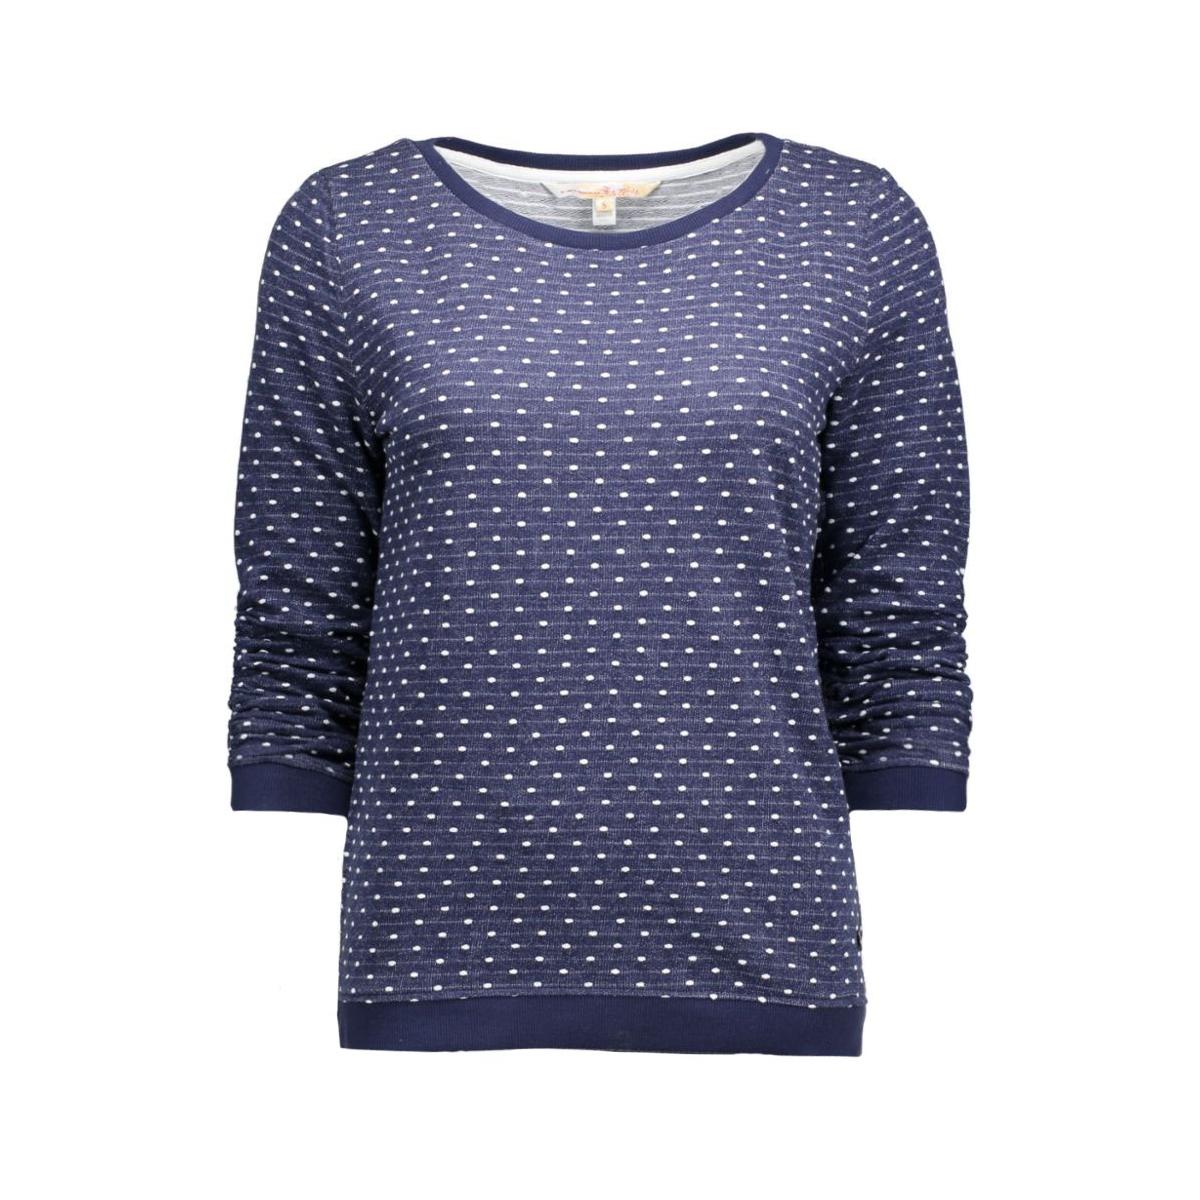 2530545.09.71 tom tailor sweater 6724